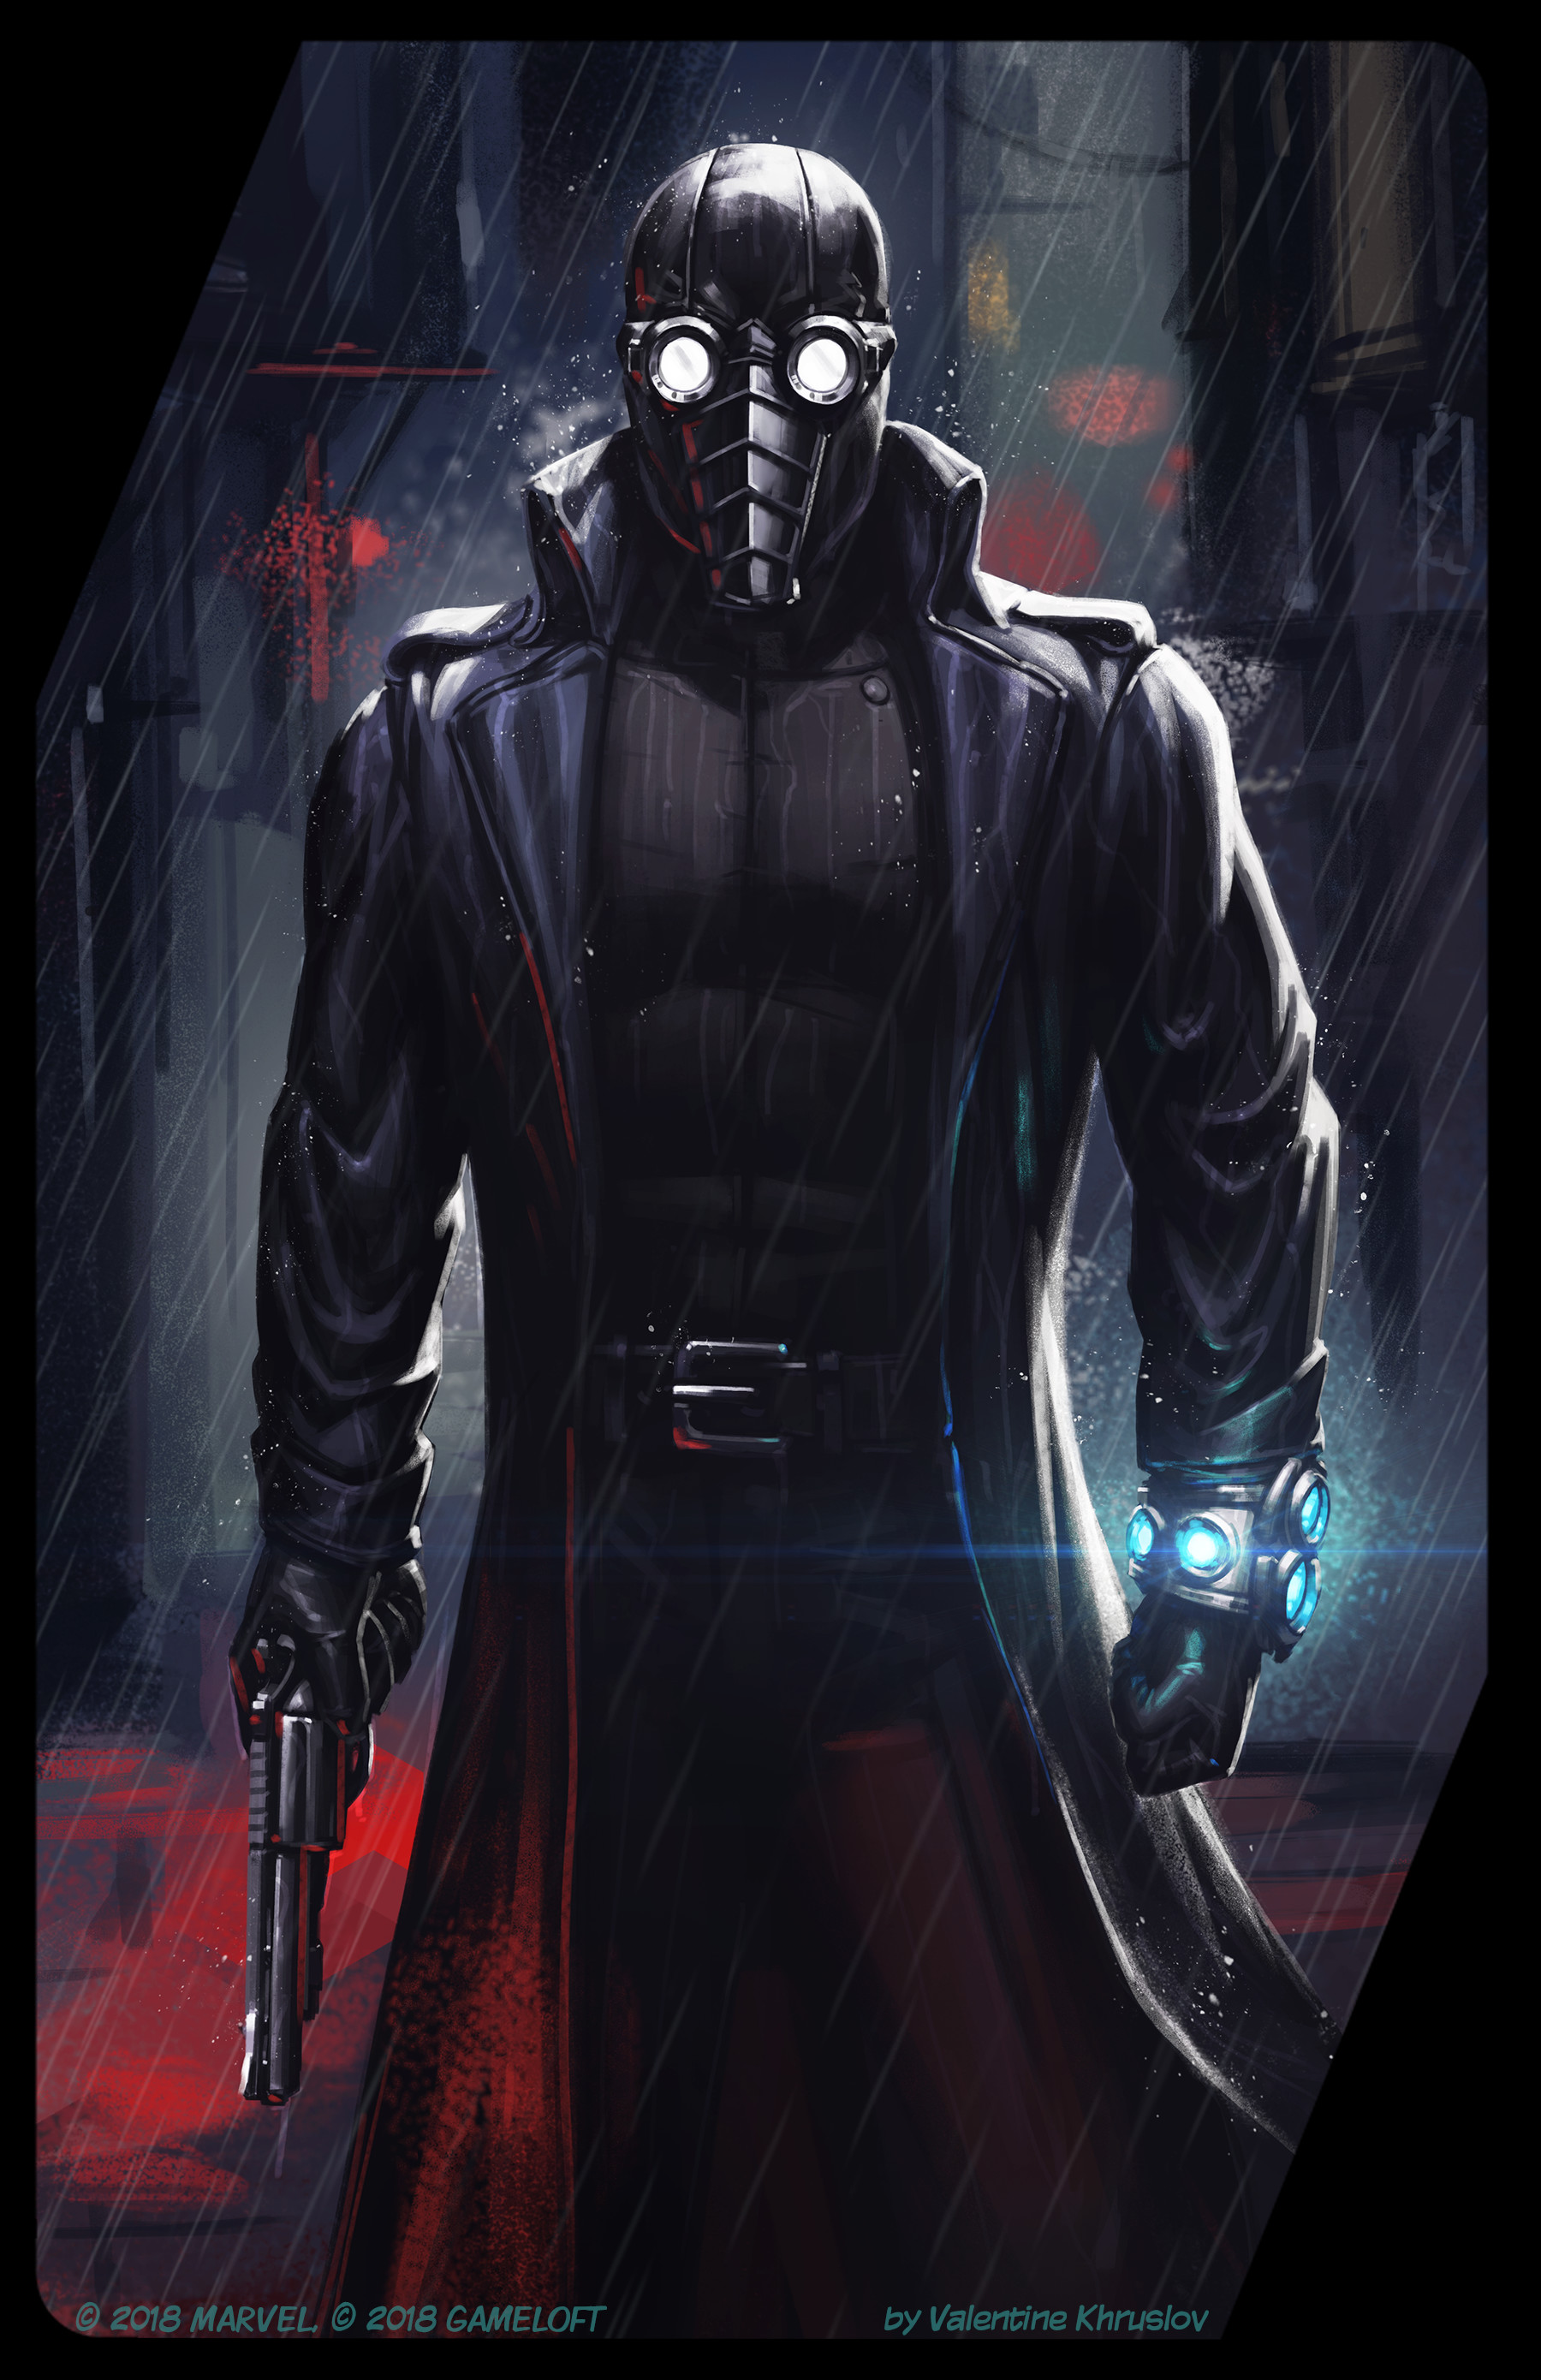 Artstation spider man noir valentine khruslov - Spiderman noir 3 ...